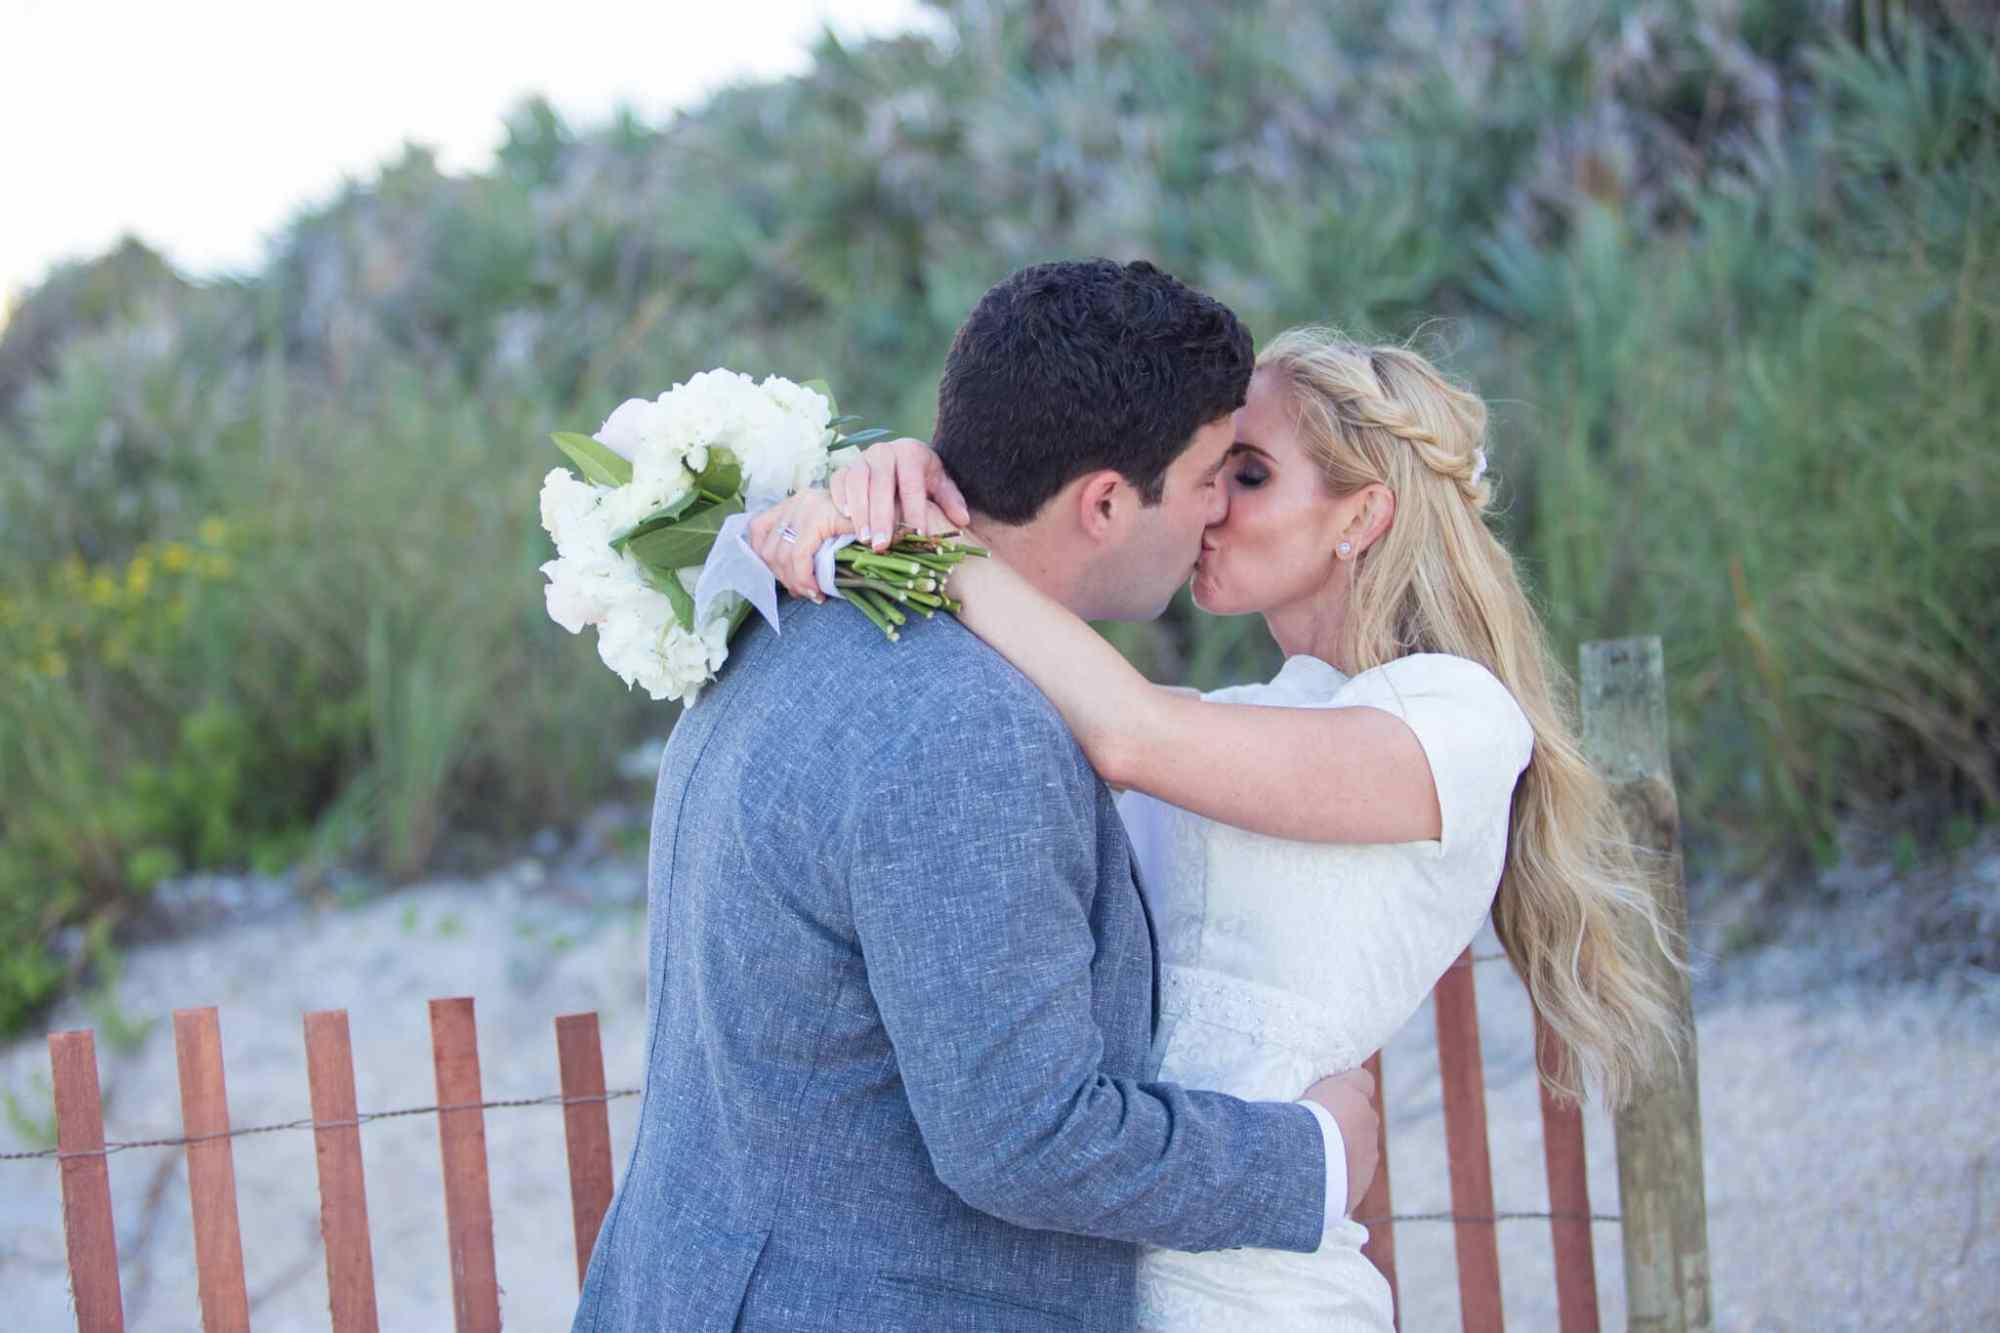 Wedding photography in new Smyrna beach fl